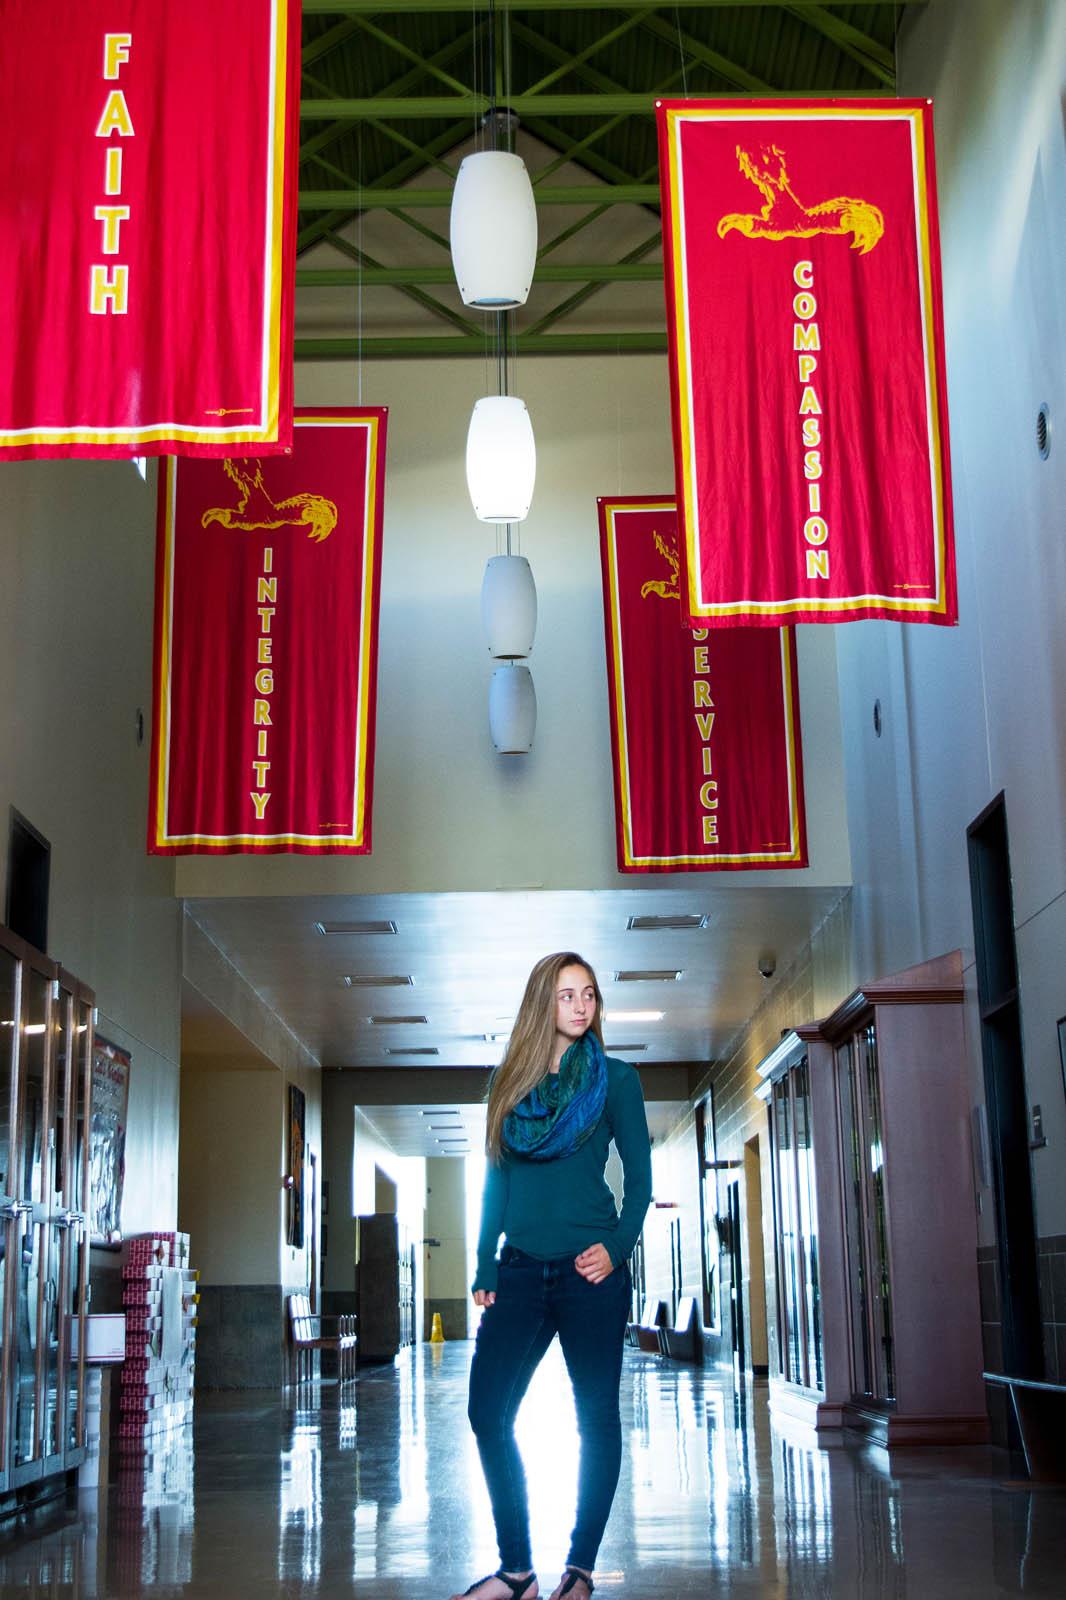 Senior Pictures by Brooke Ashley Photography in Dayton Ohio